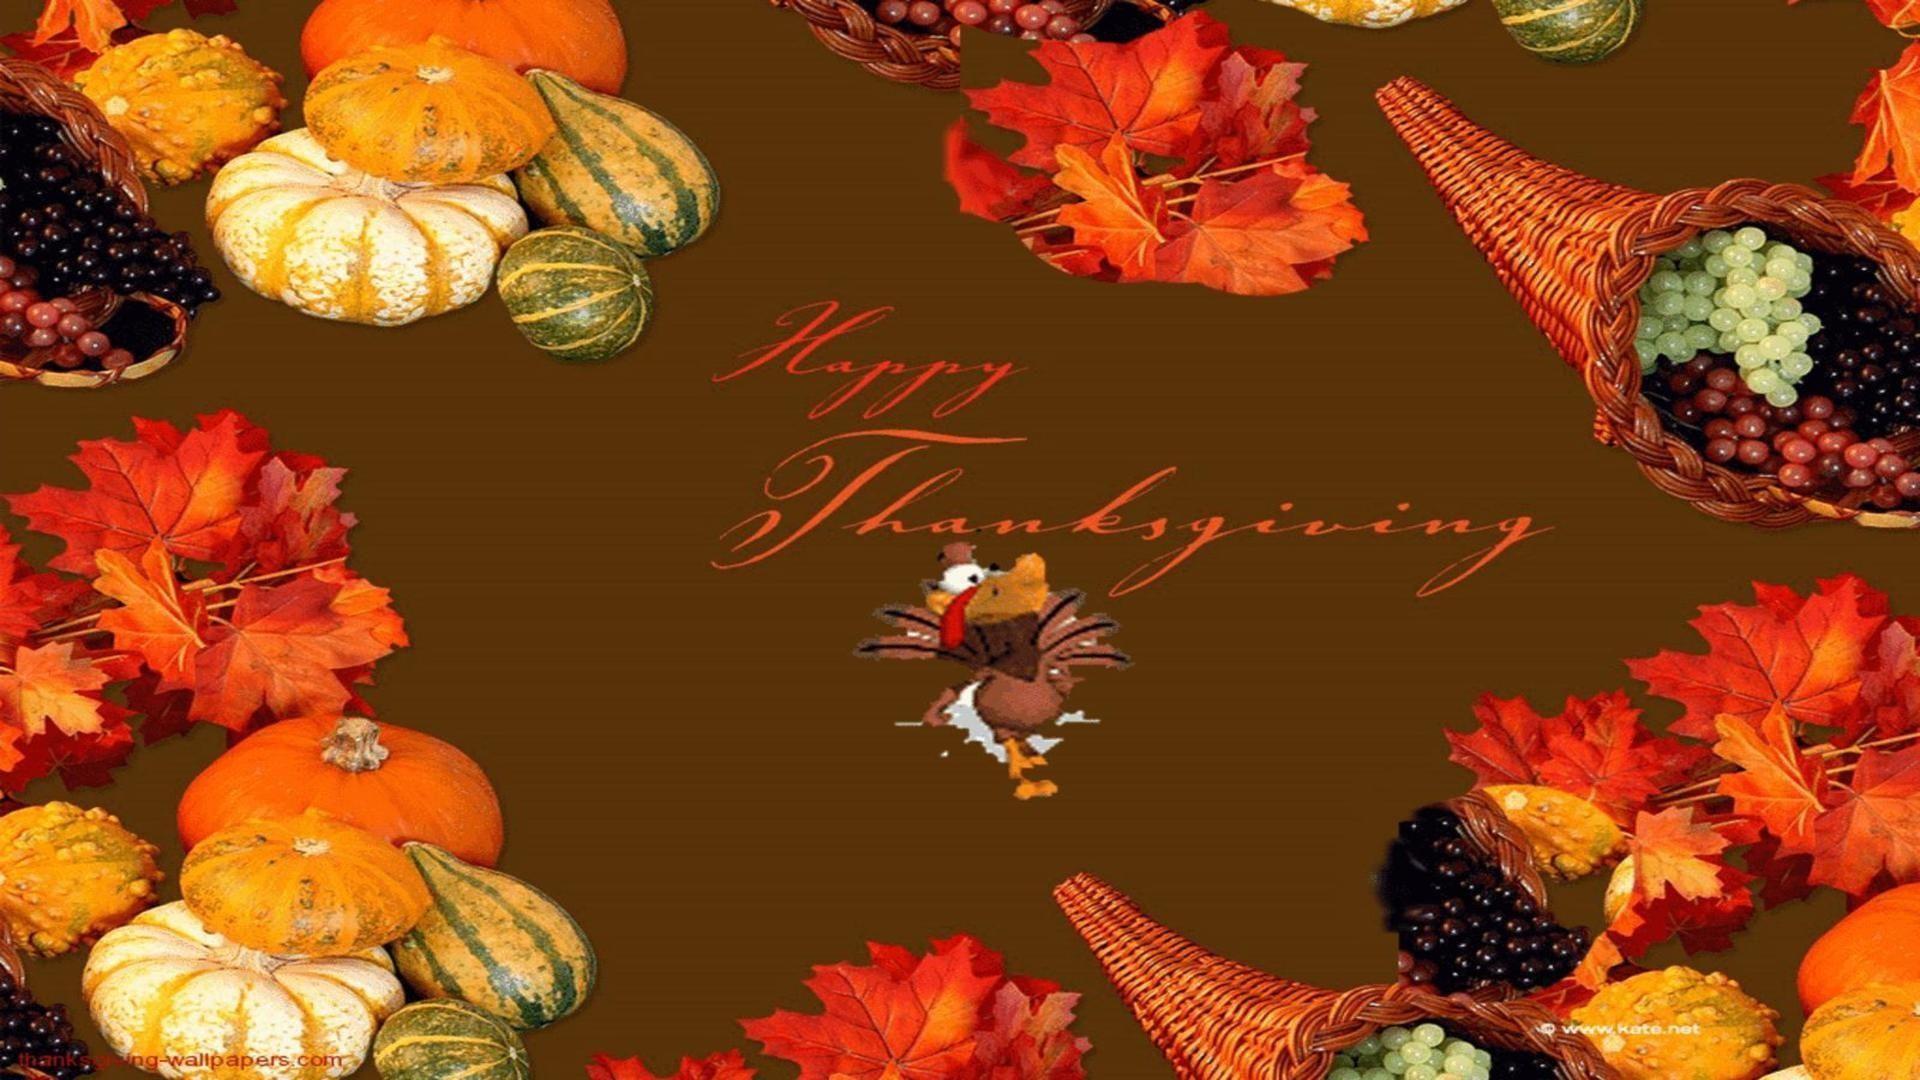 Happy Thanksgiving Background Wallpaper